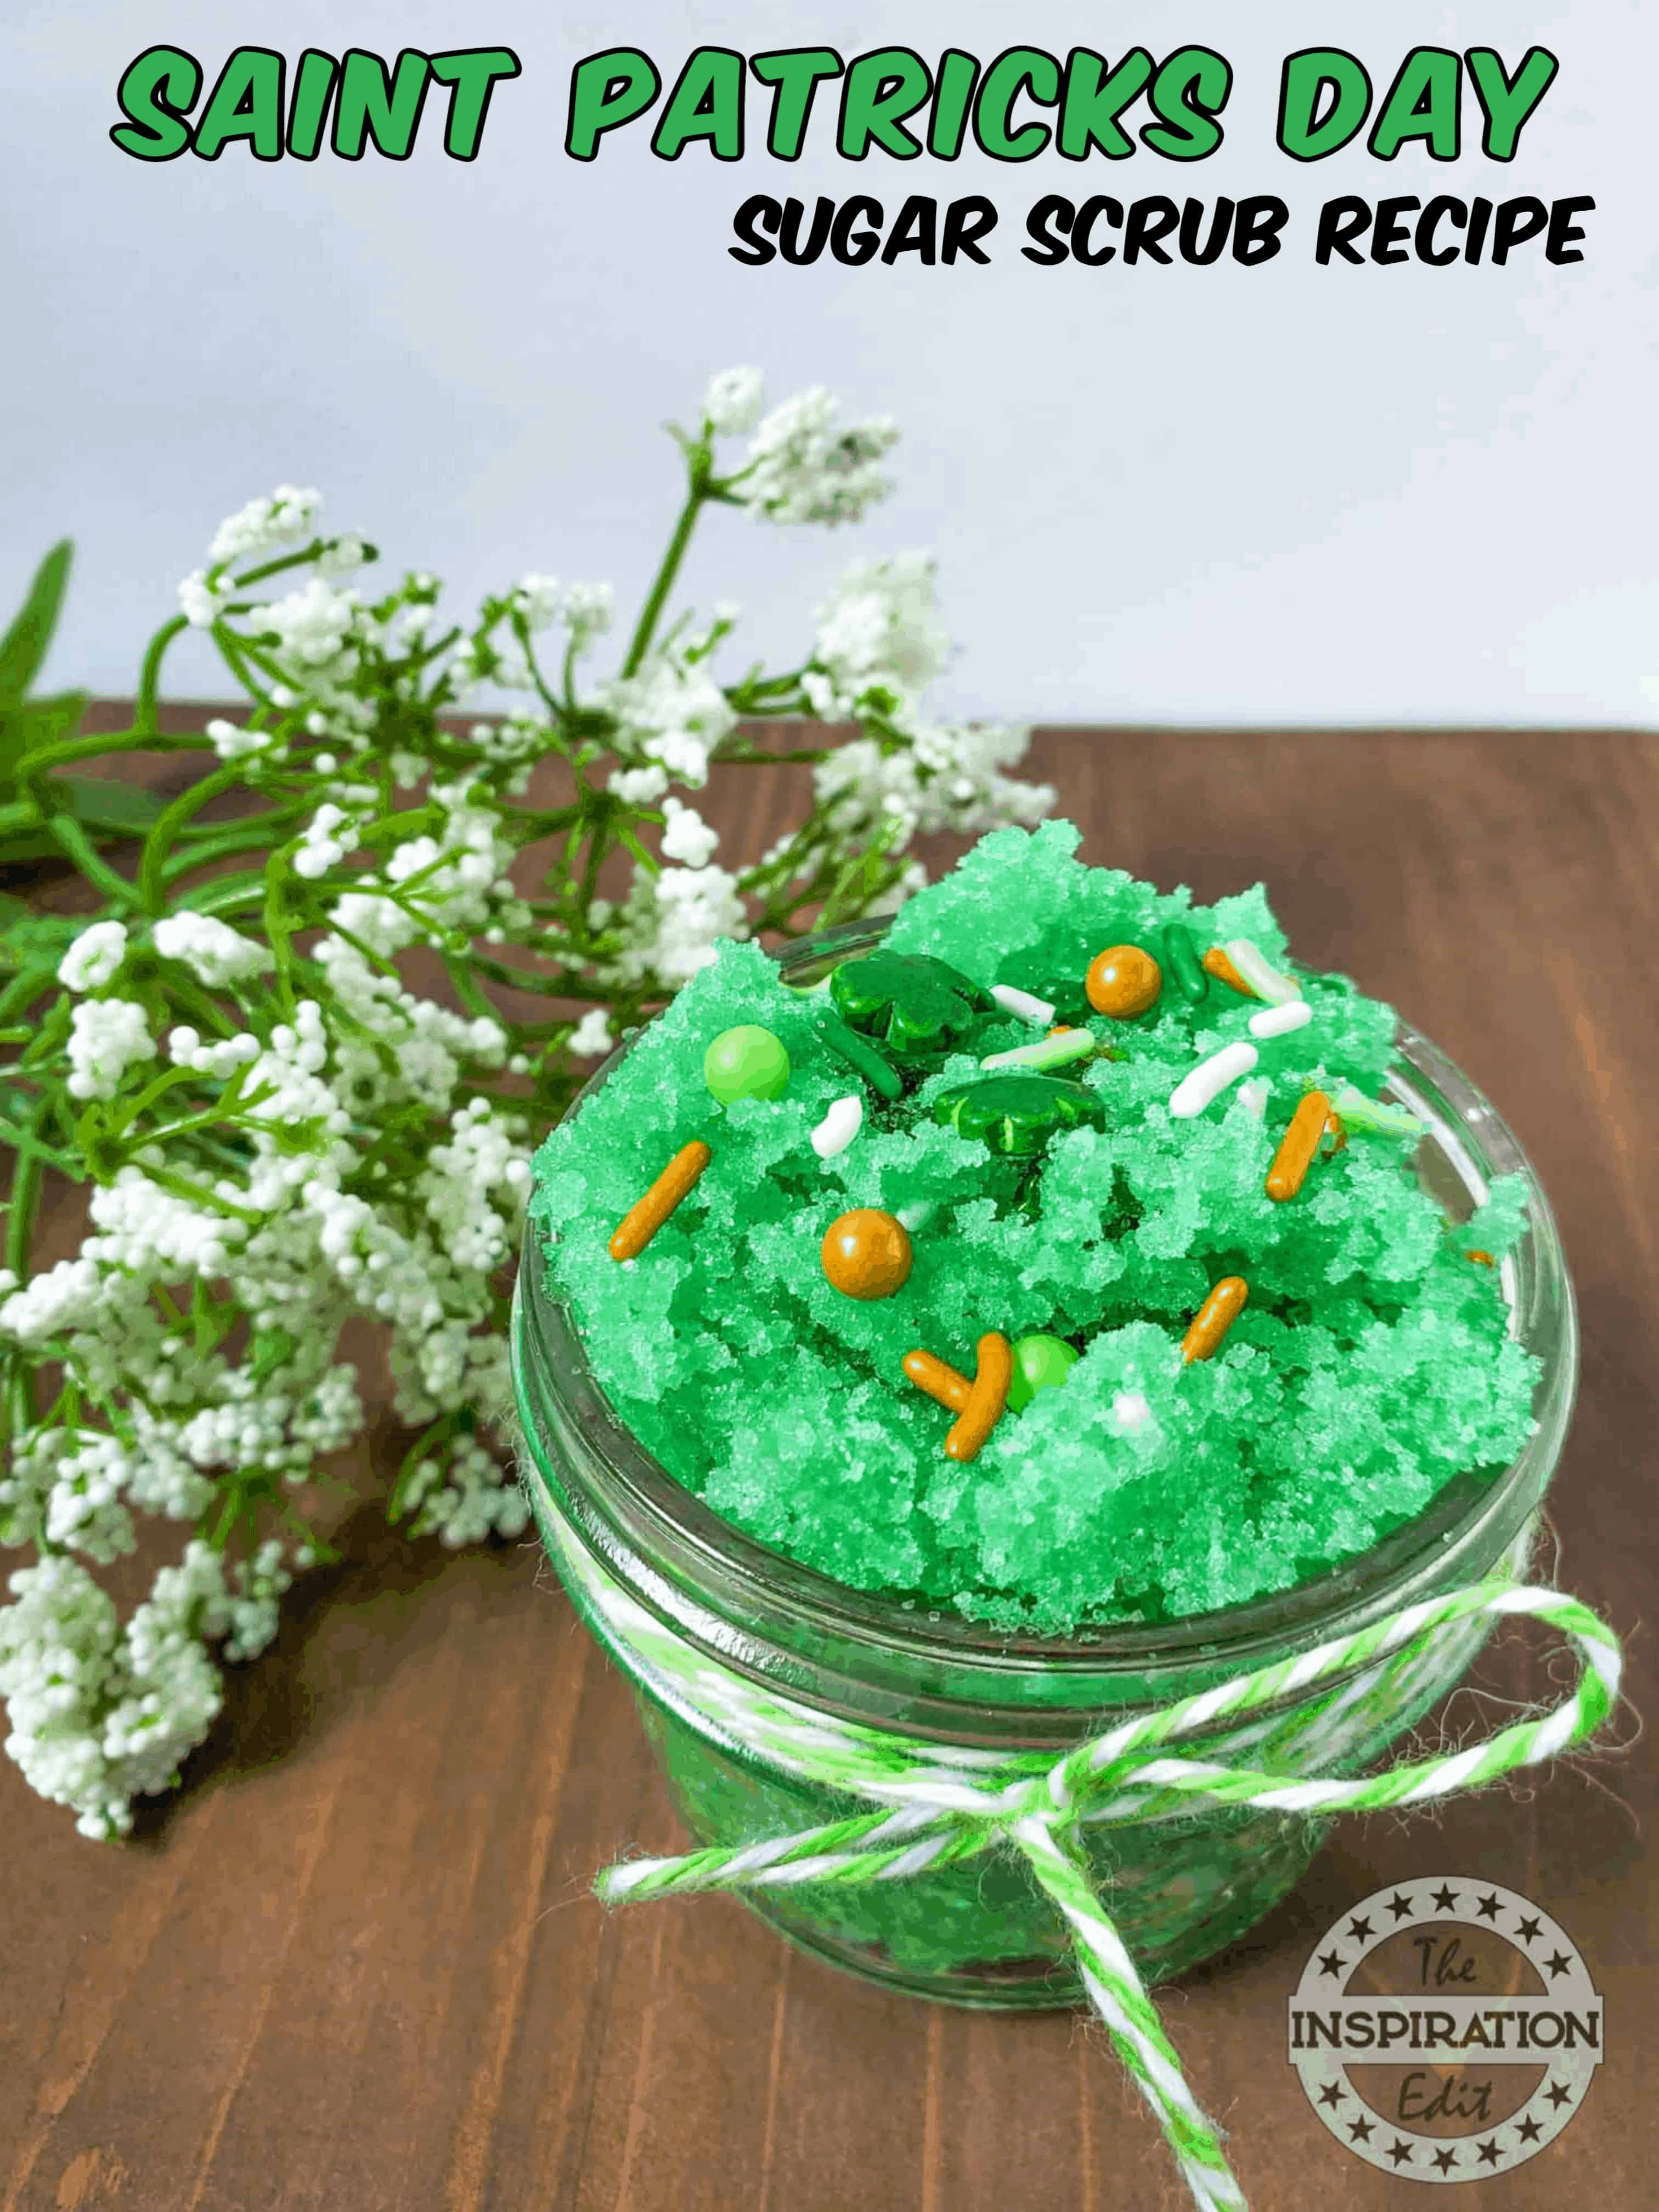 Saint Patrick's Day sugar scrub